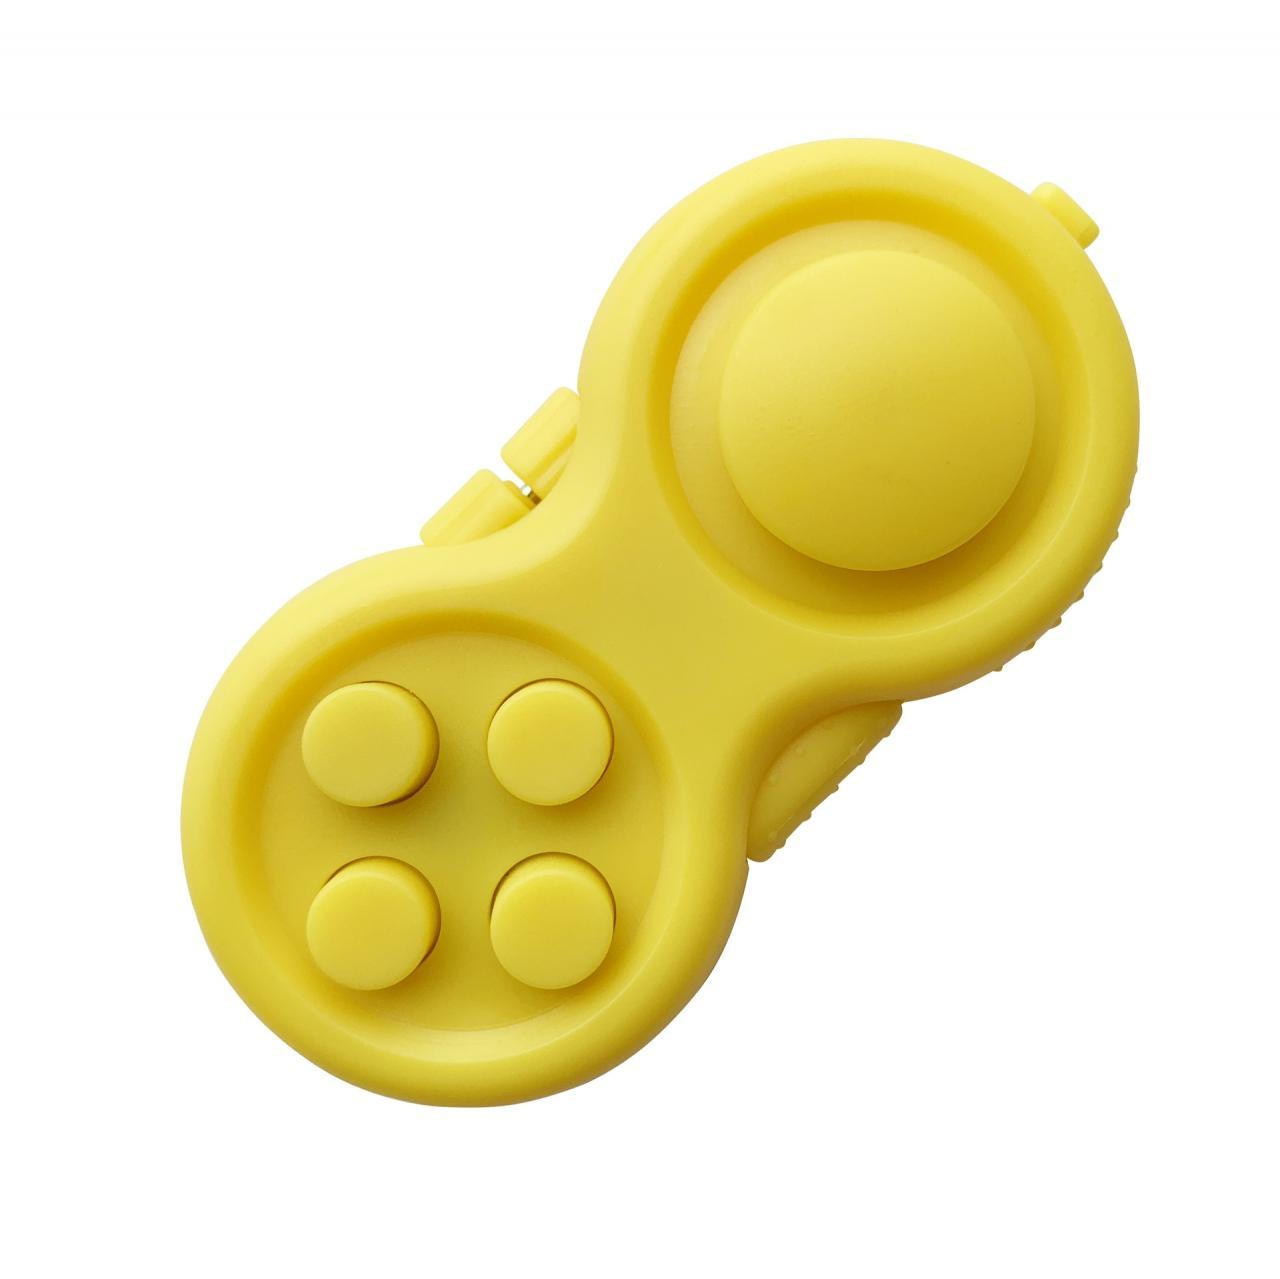 H60dba77f224e4b9eaa460b7ee9ec4106B - Fidget Pad